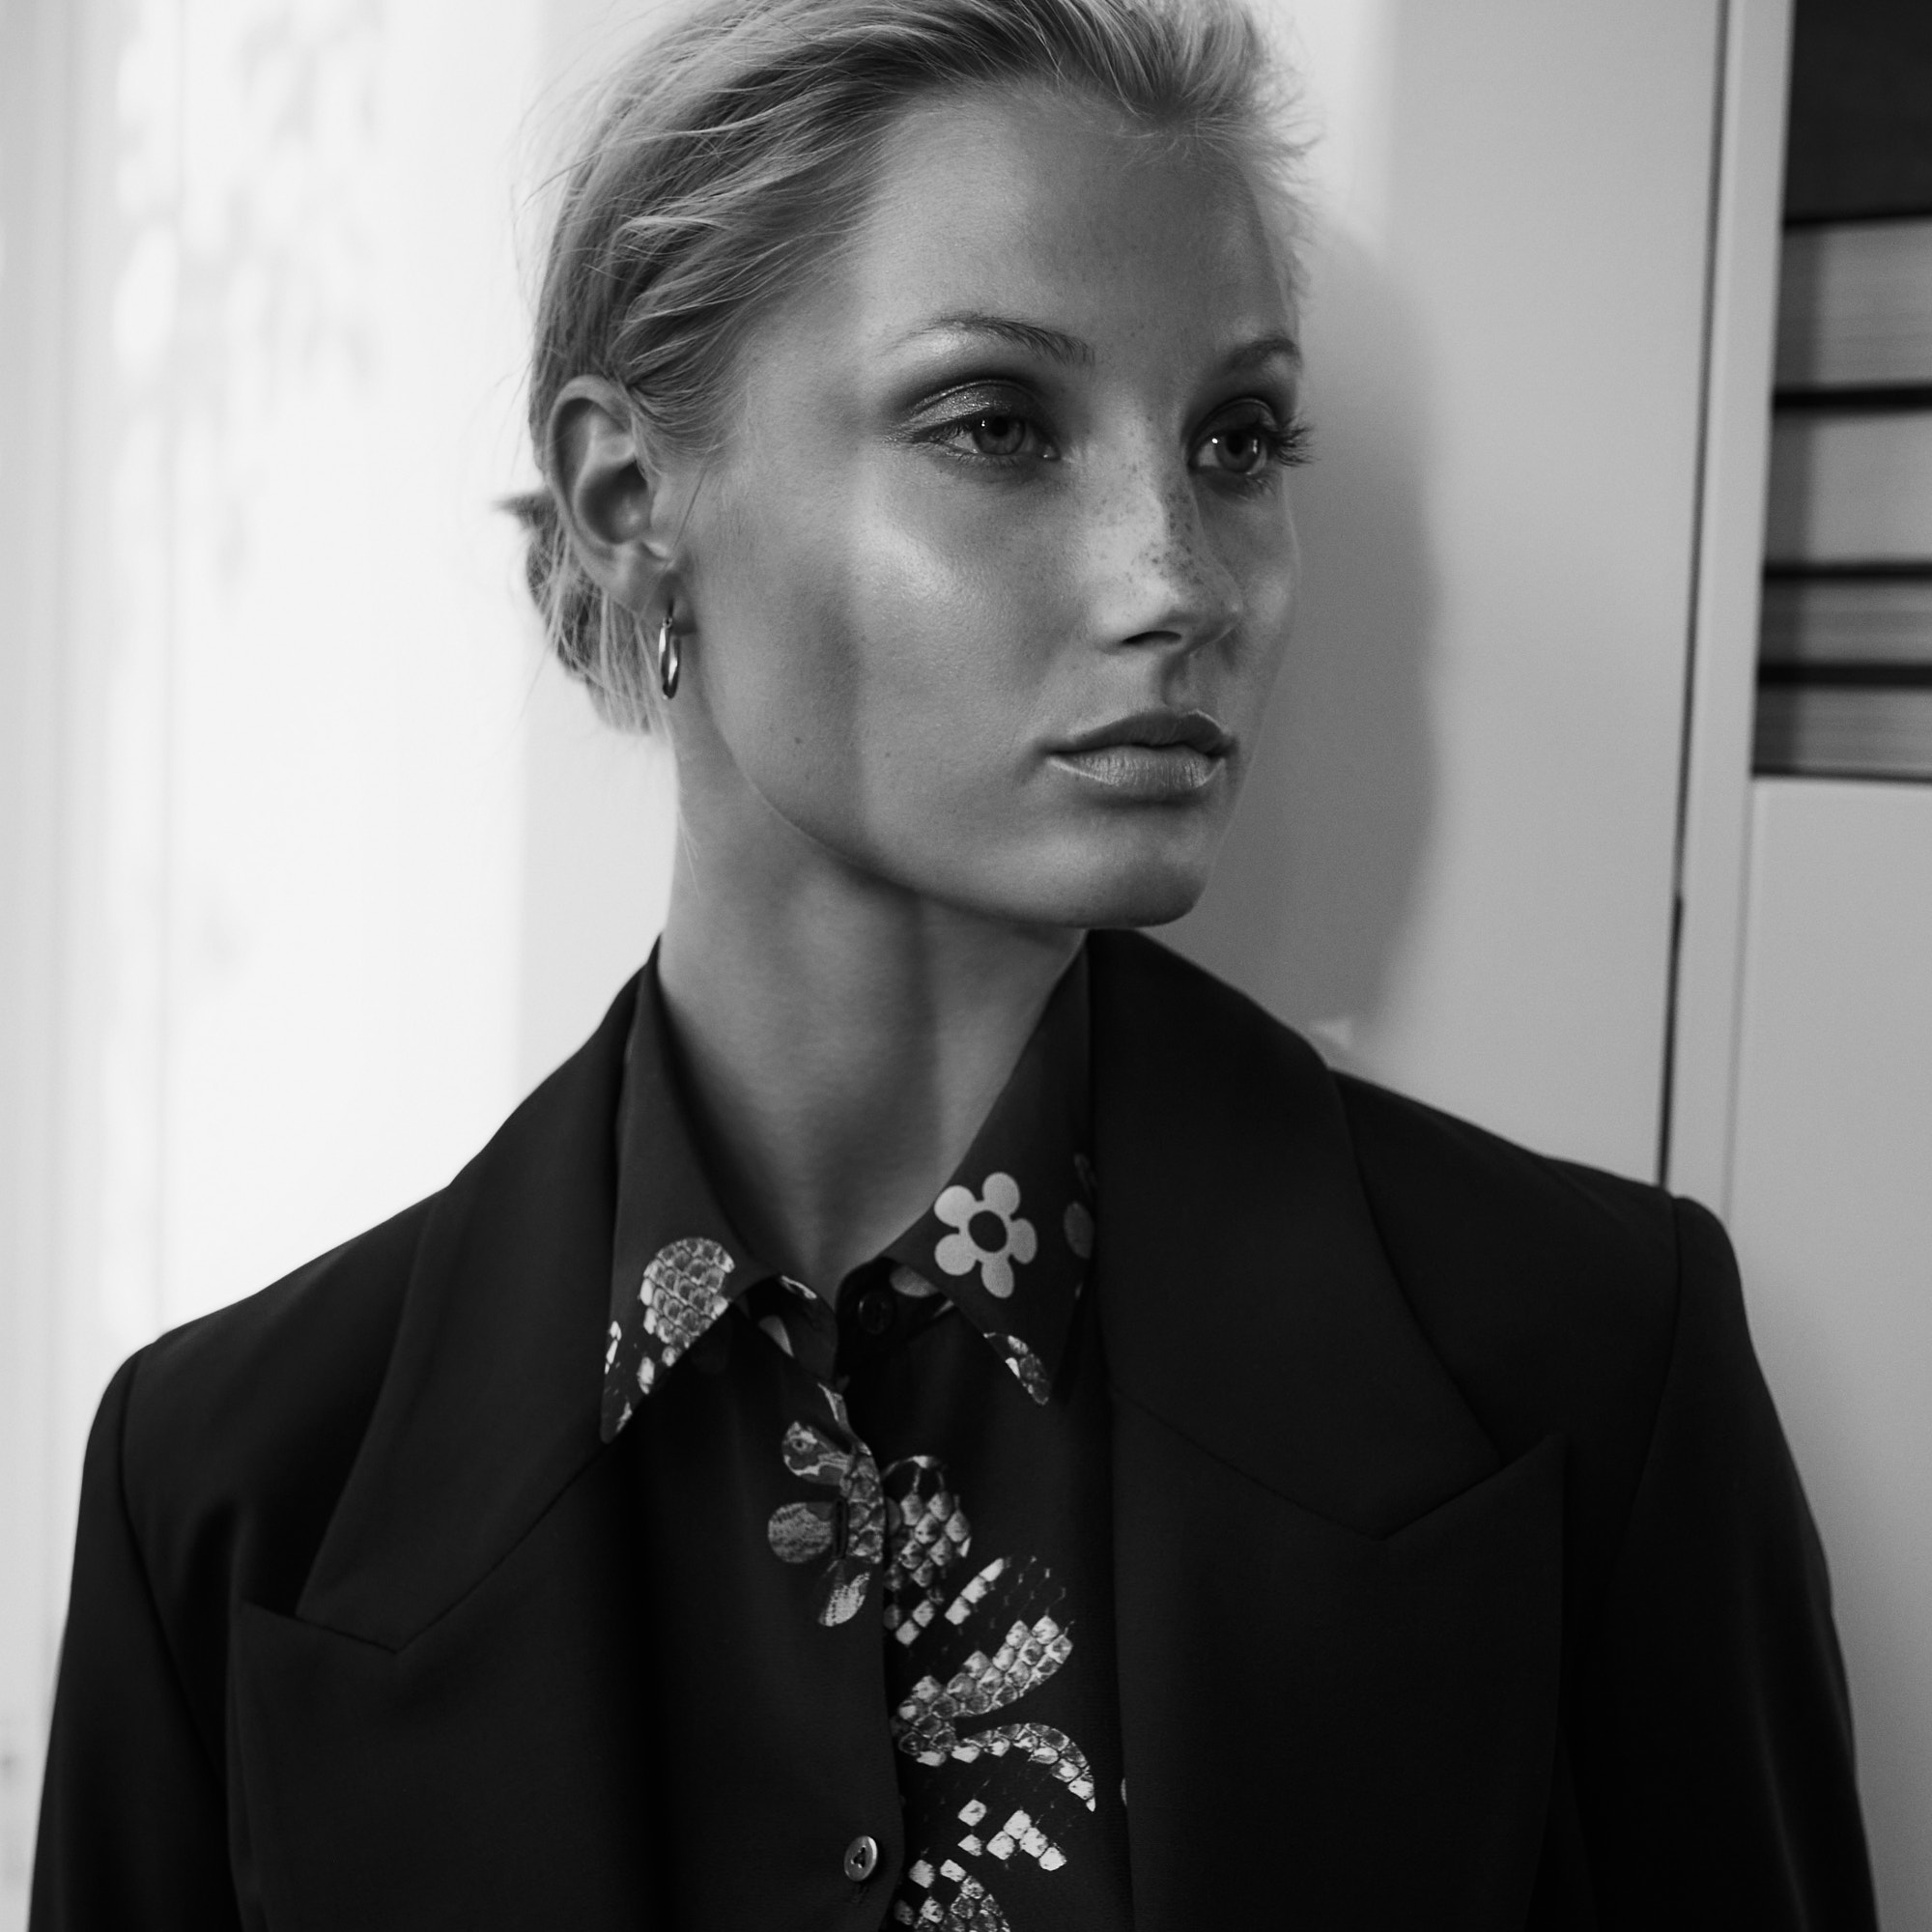 bernd-westphal-stillstars-vanlaack-women-auttum-winter-2020-fashion-still-life-photography-005